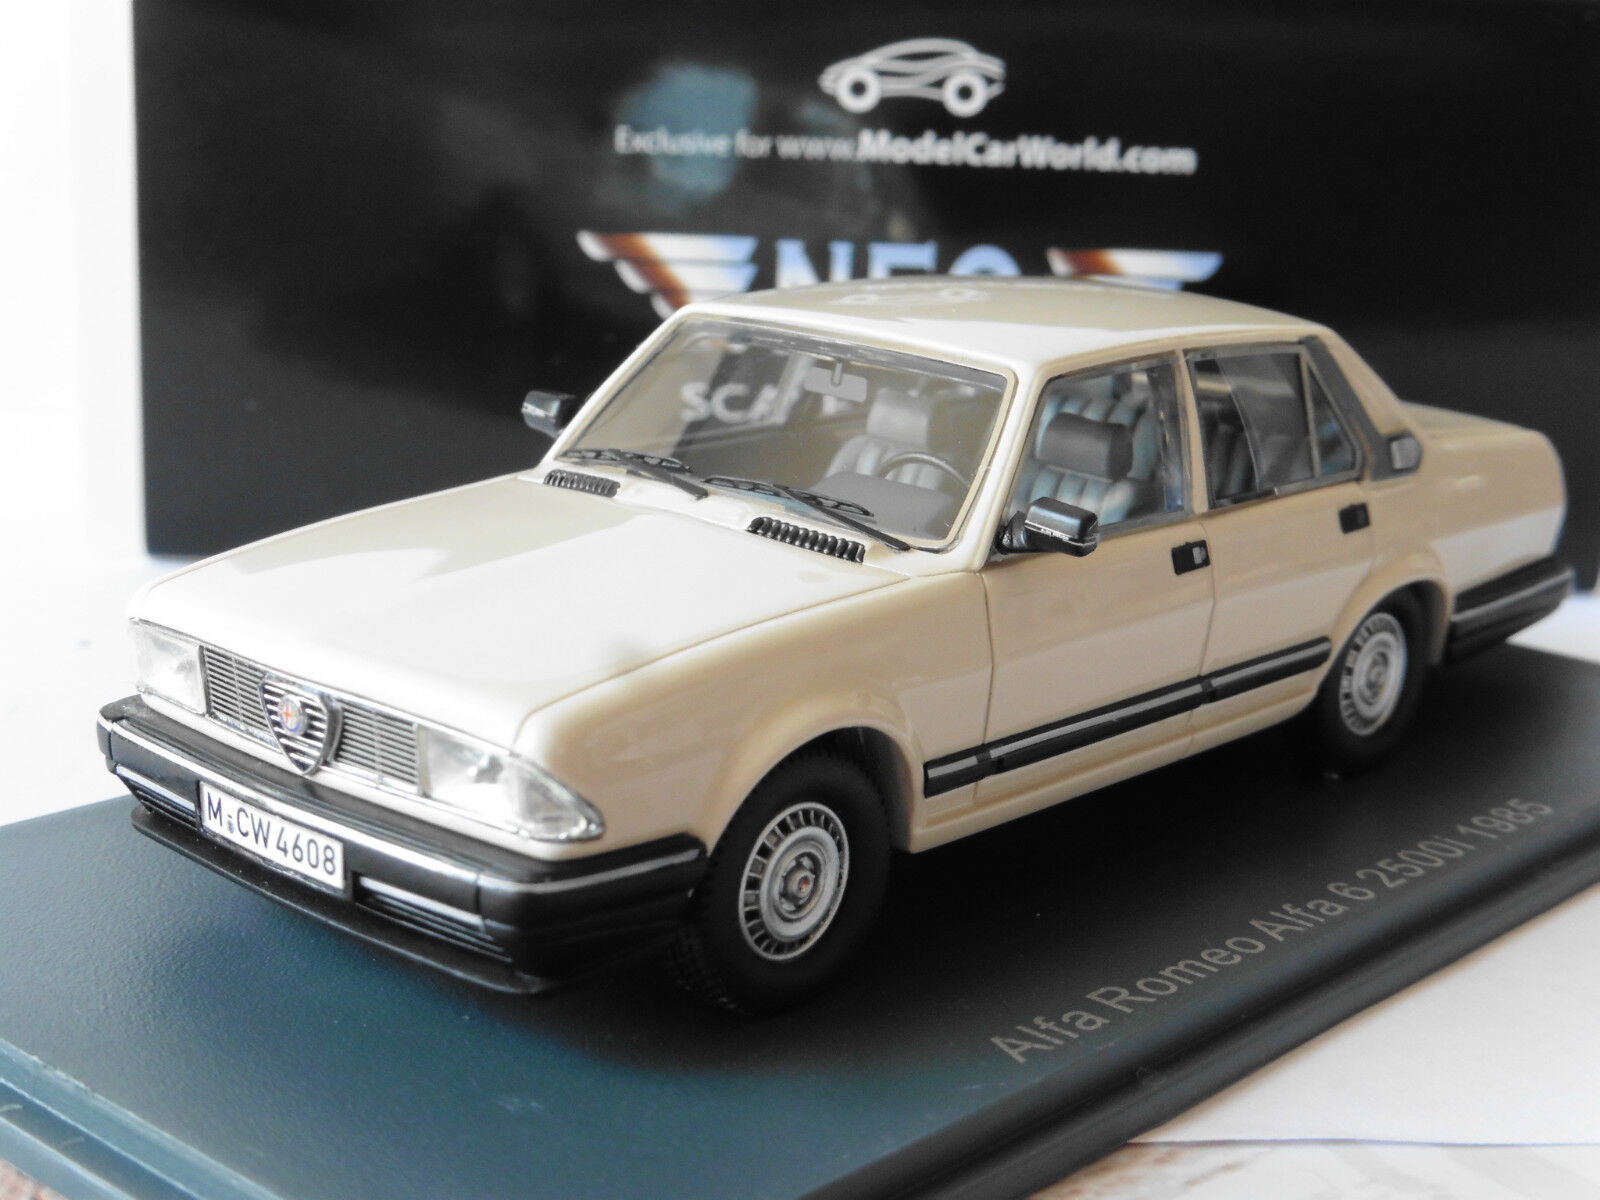 ALFA ROMEO 6 2500I 1985 bianca NEO 45608 LHD 1 43 LEFT HAND DRIVE WEISS BIANCA